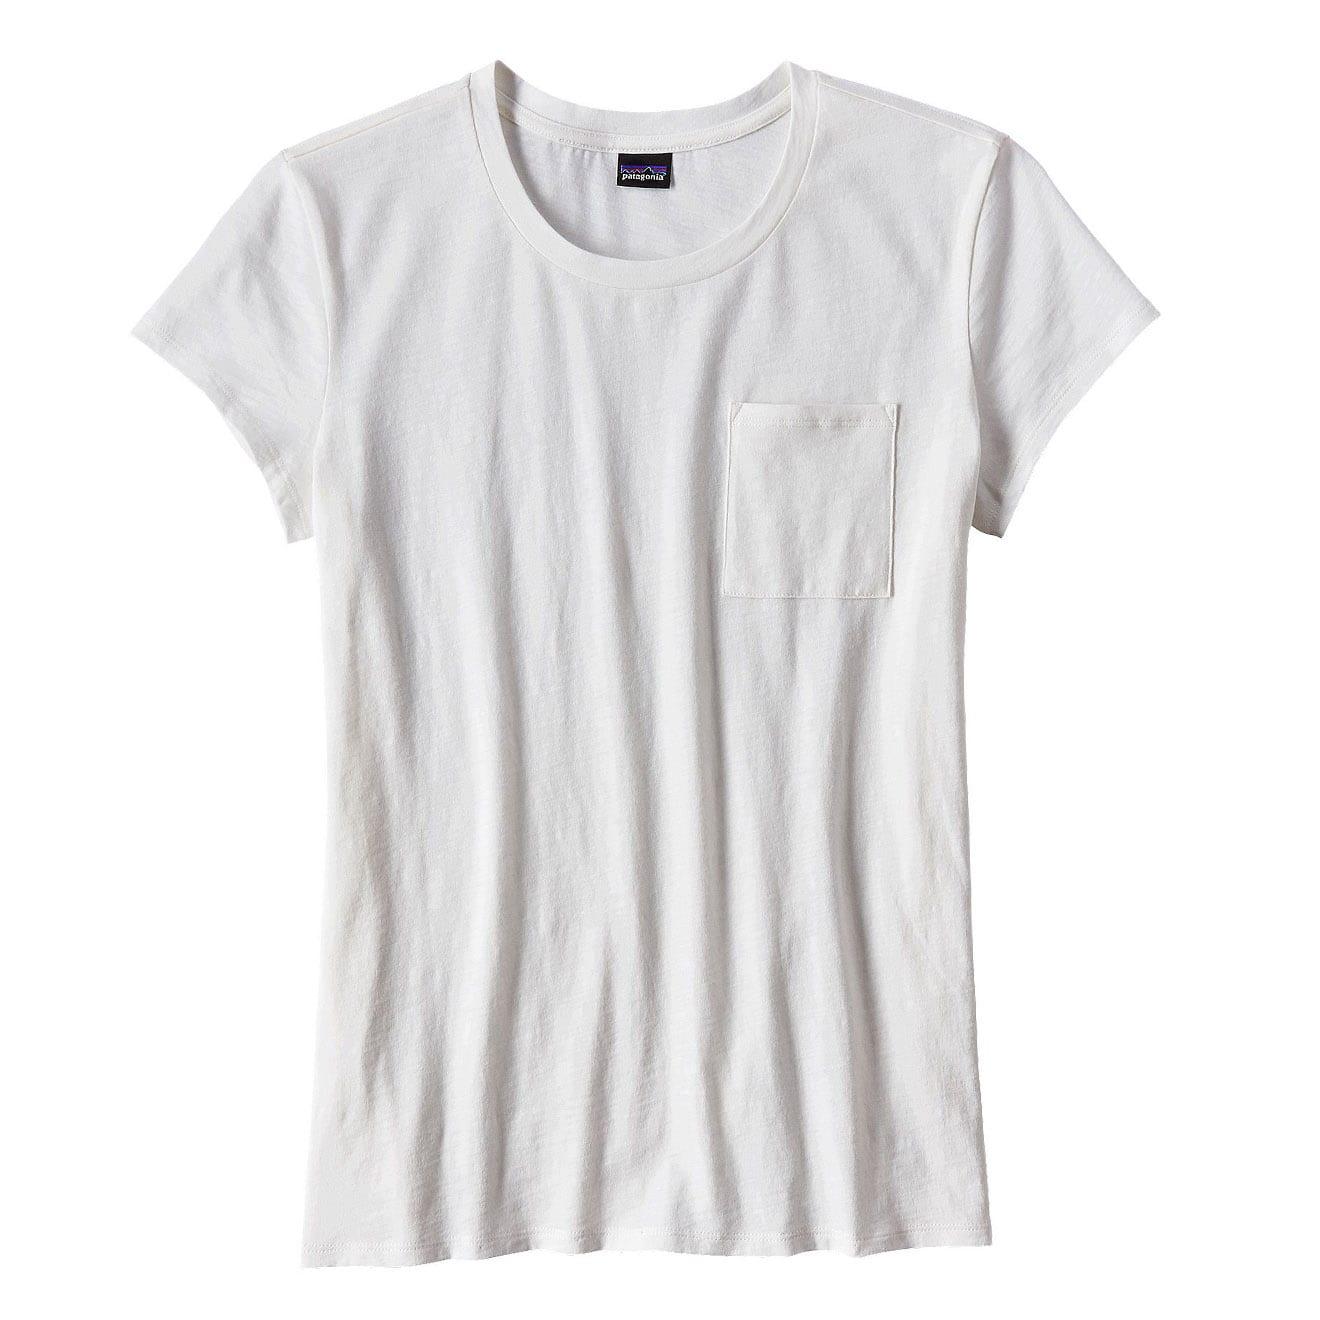 Patagonia Womens Mainstay T-Shirt White